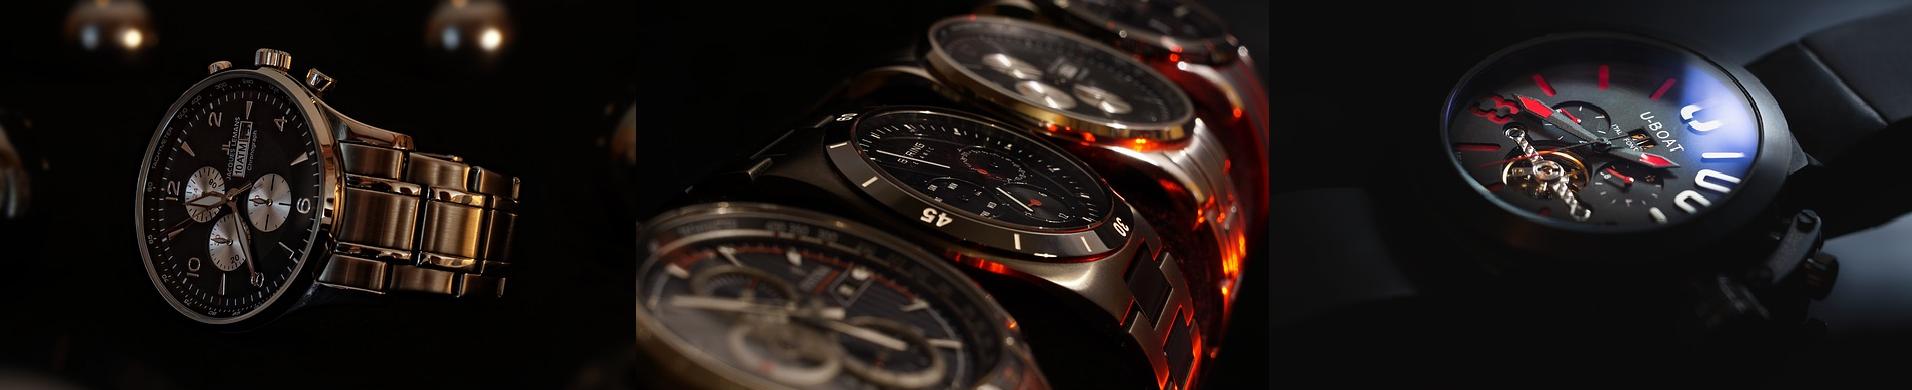 kronograf klockor